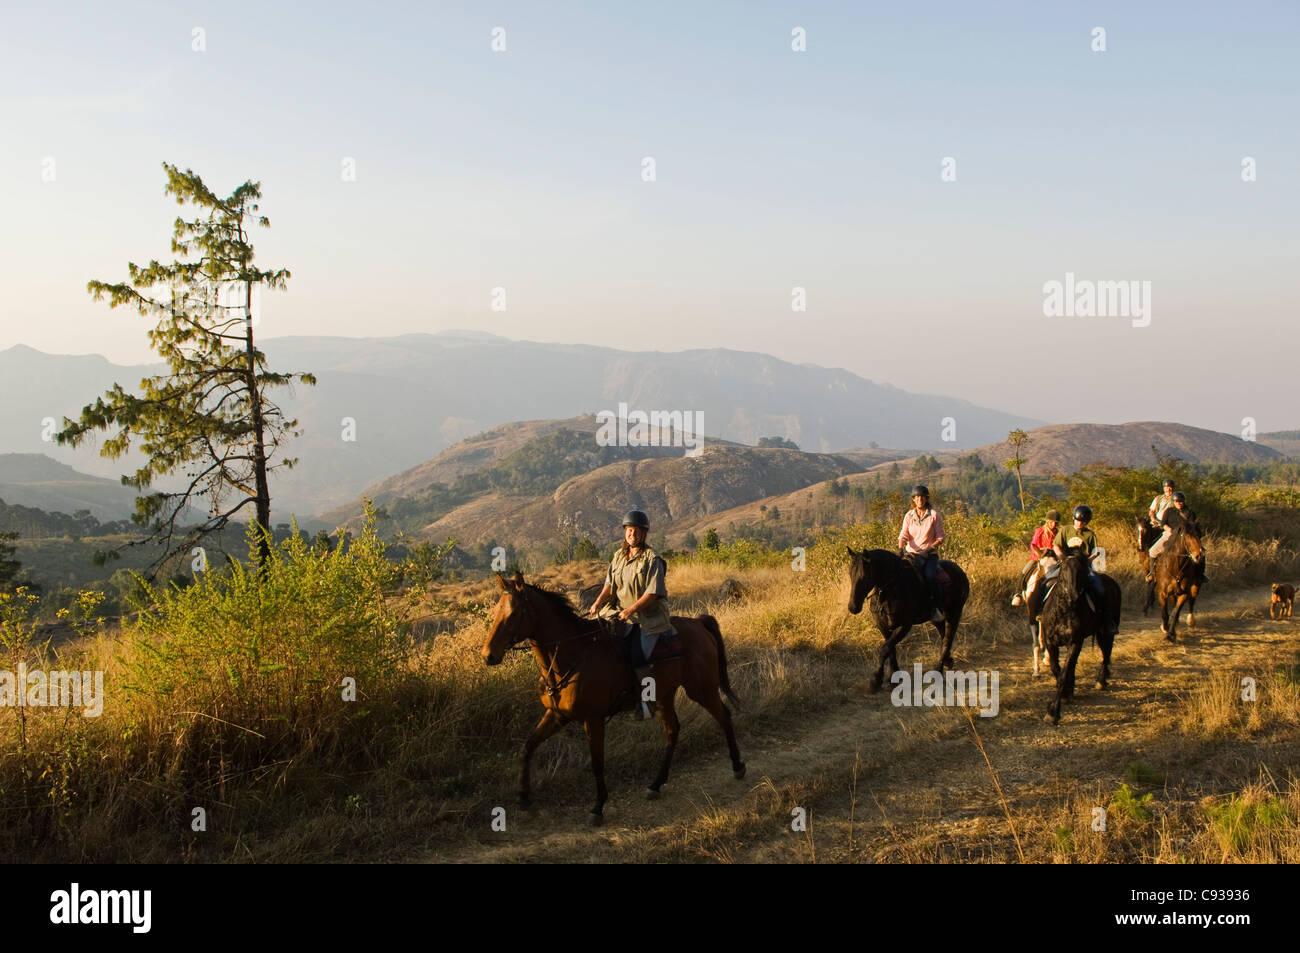 Malawi, Zomba Plateau.  Ein Pferd Reiten Safari ist ein beliebter Weg, Zomba Plateau zu erkunden. Stockbild